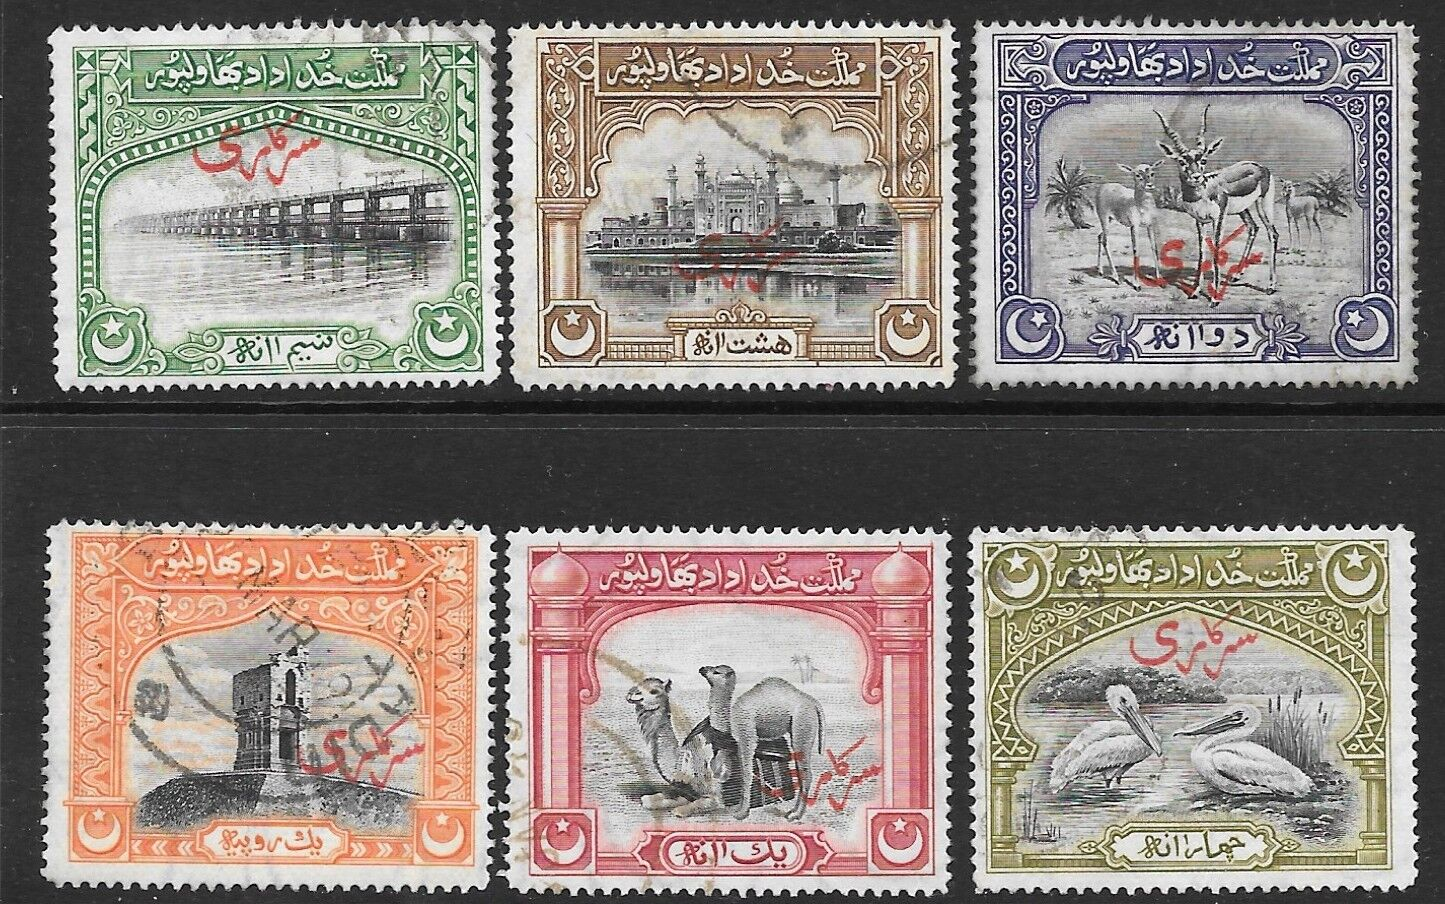 PAKISTAN-BAHAWALPUR SGO1/6 1945 OFFICIAL SET FINE USED